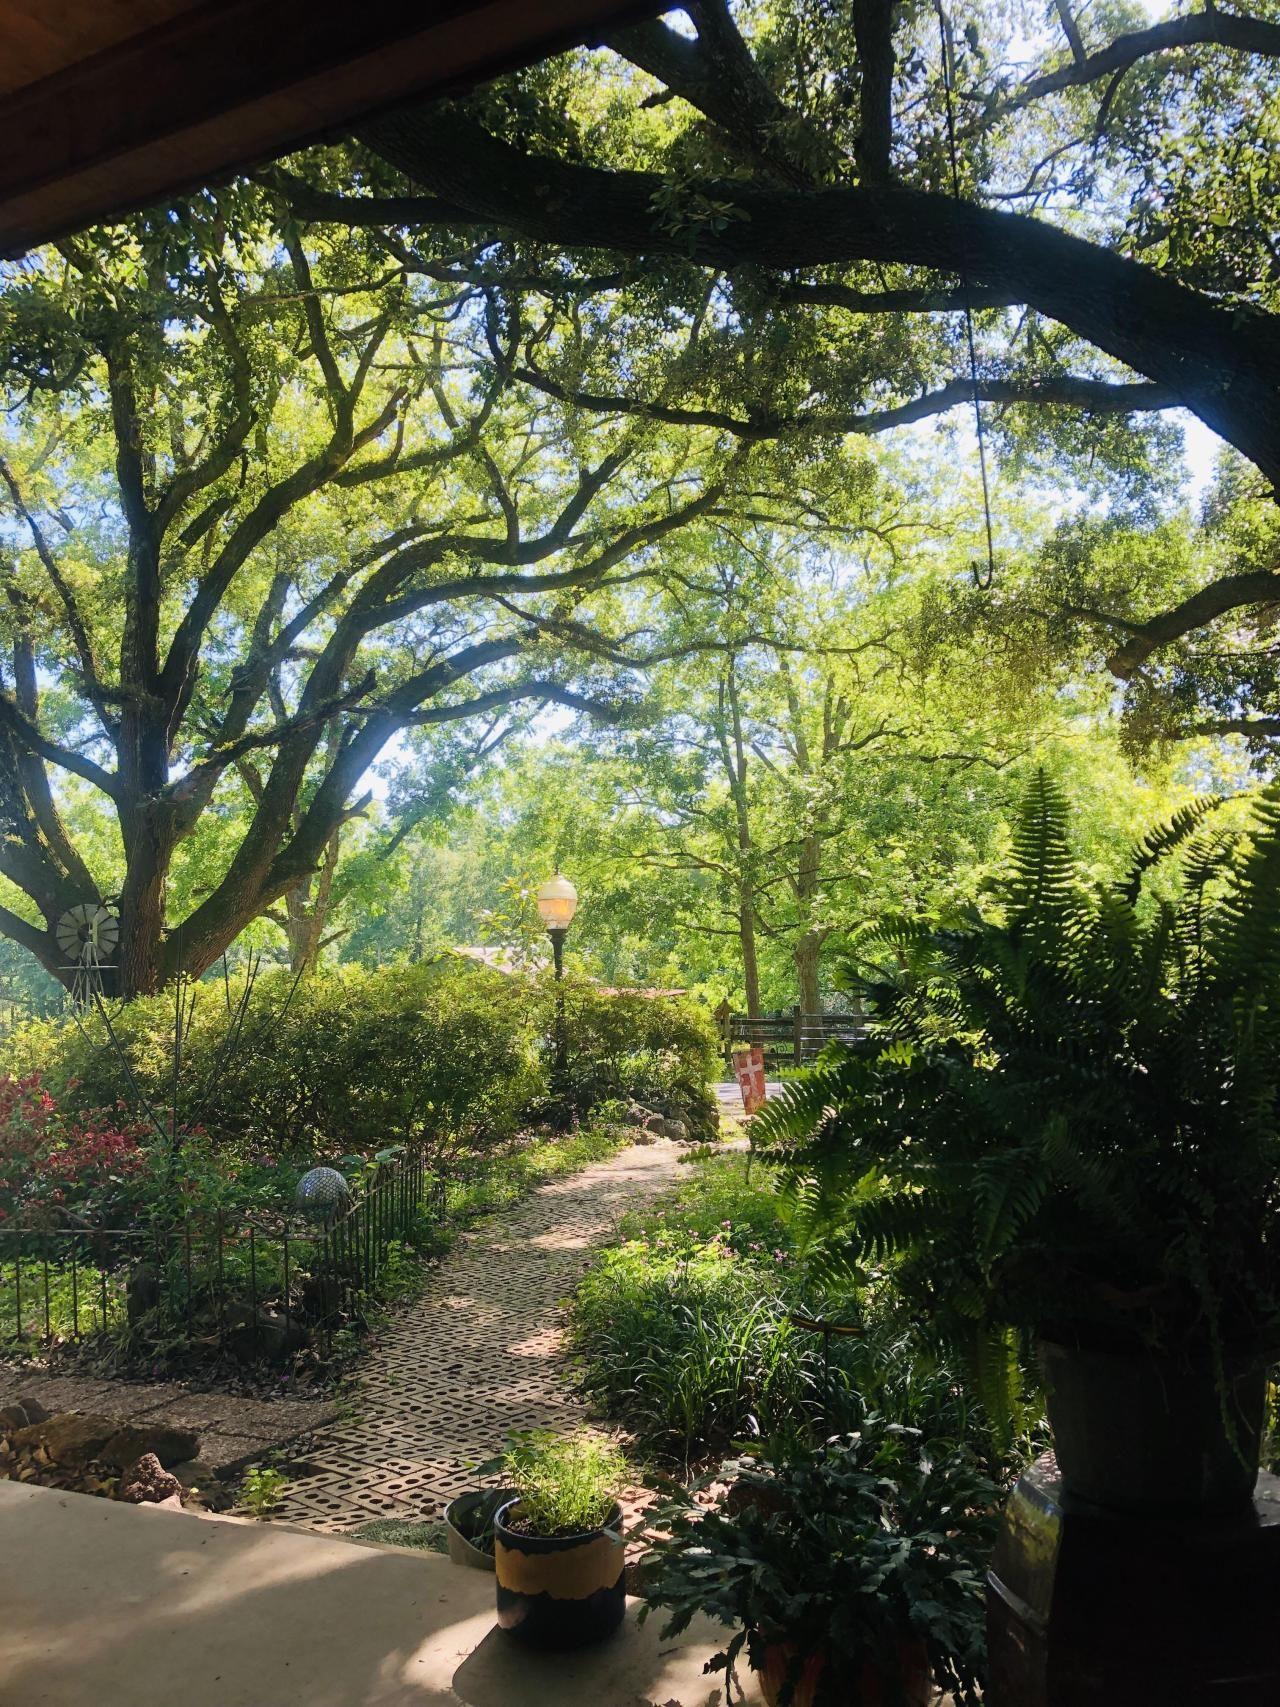 Grandmas backyard looks like a magical forest! in 2020 ...